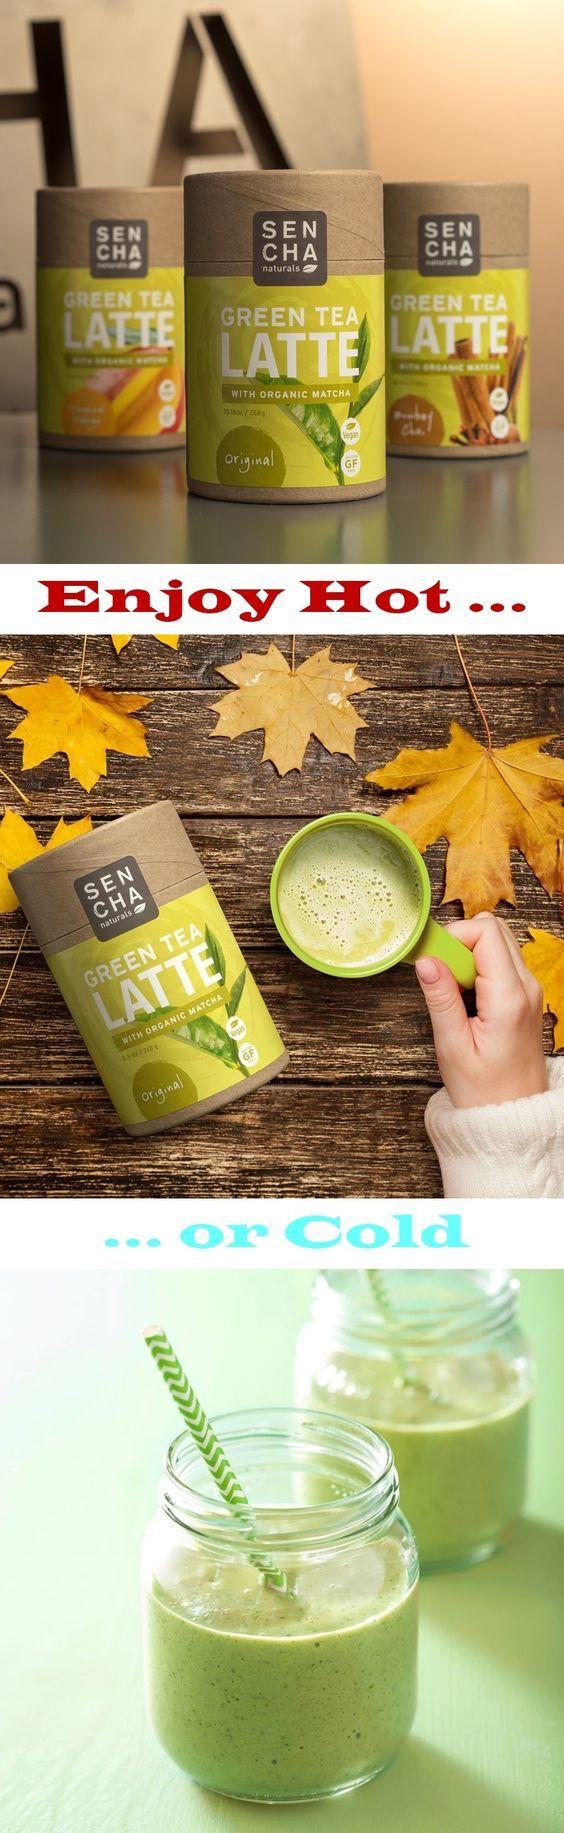 Sencha Naturals Green Tea Latte Mixes - Three Organic Matcha Mixes, all vegan, dairy-free, gluten-free, and allergy-friendly